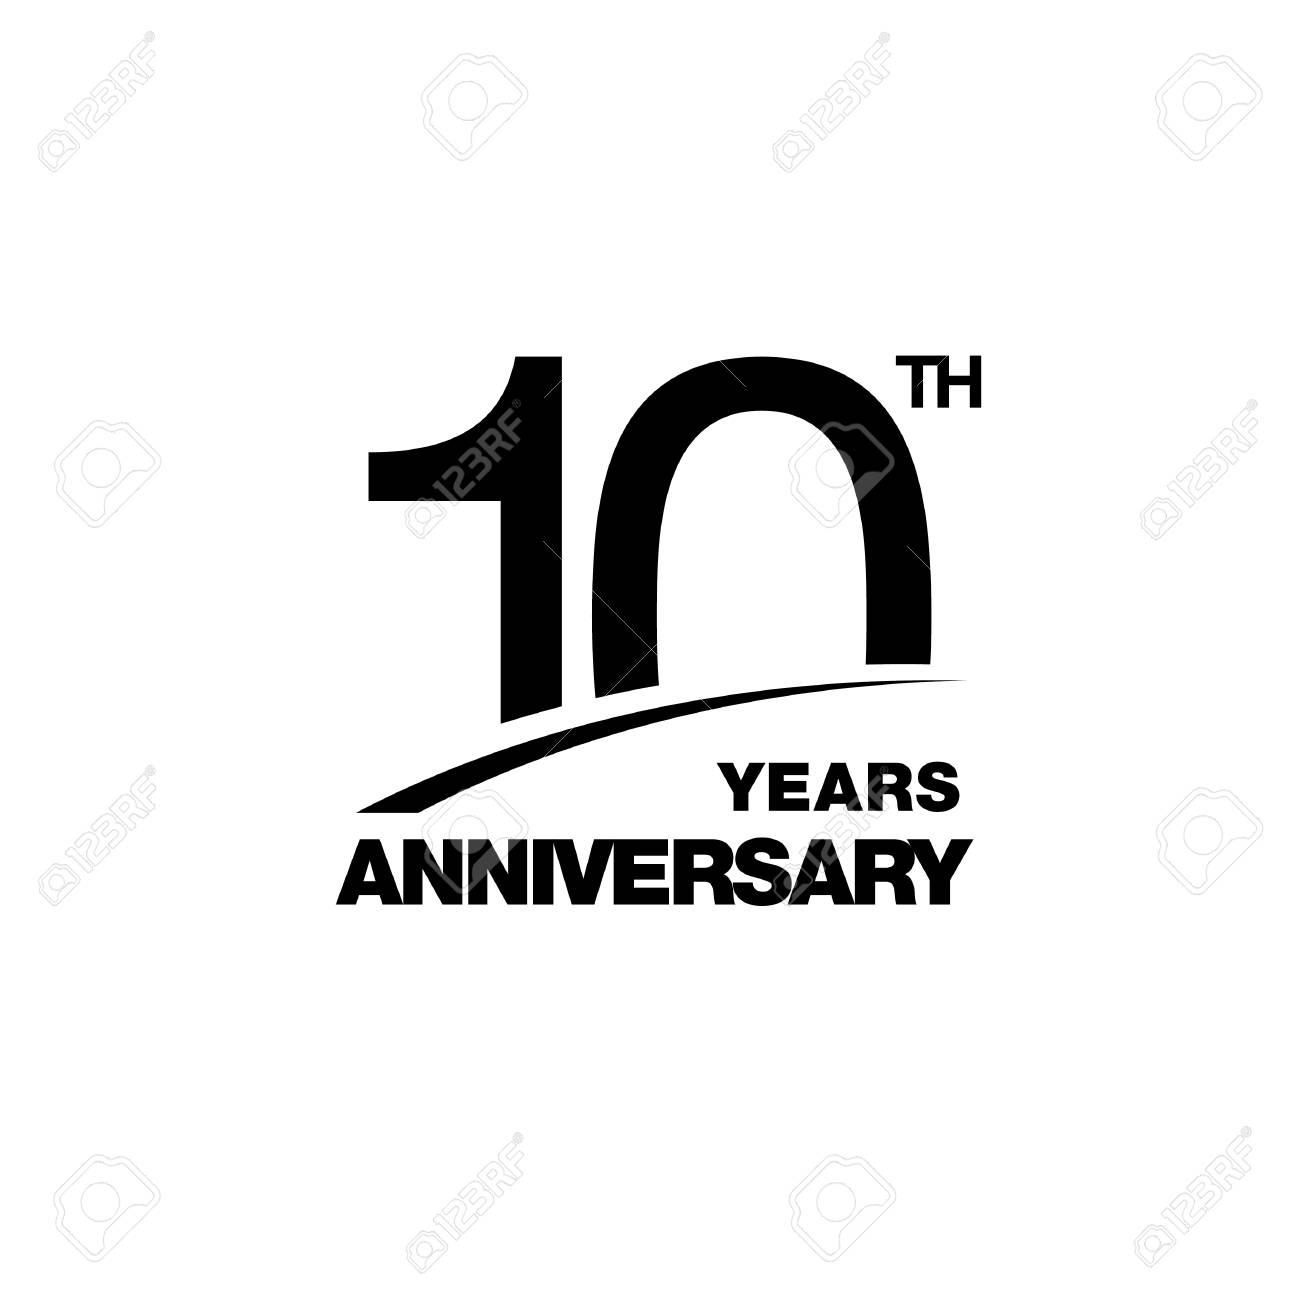 10th anniversary emblem ten years anniversary celebration symbol rh 123rf com 10th Anniversary Banner Logos Baseball Logos Clip Art